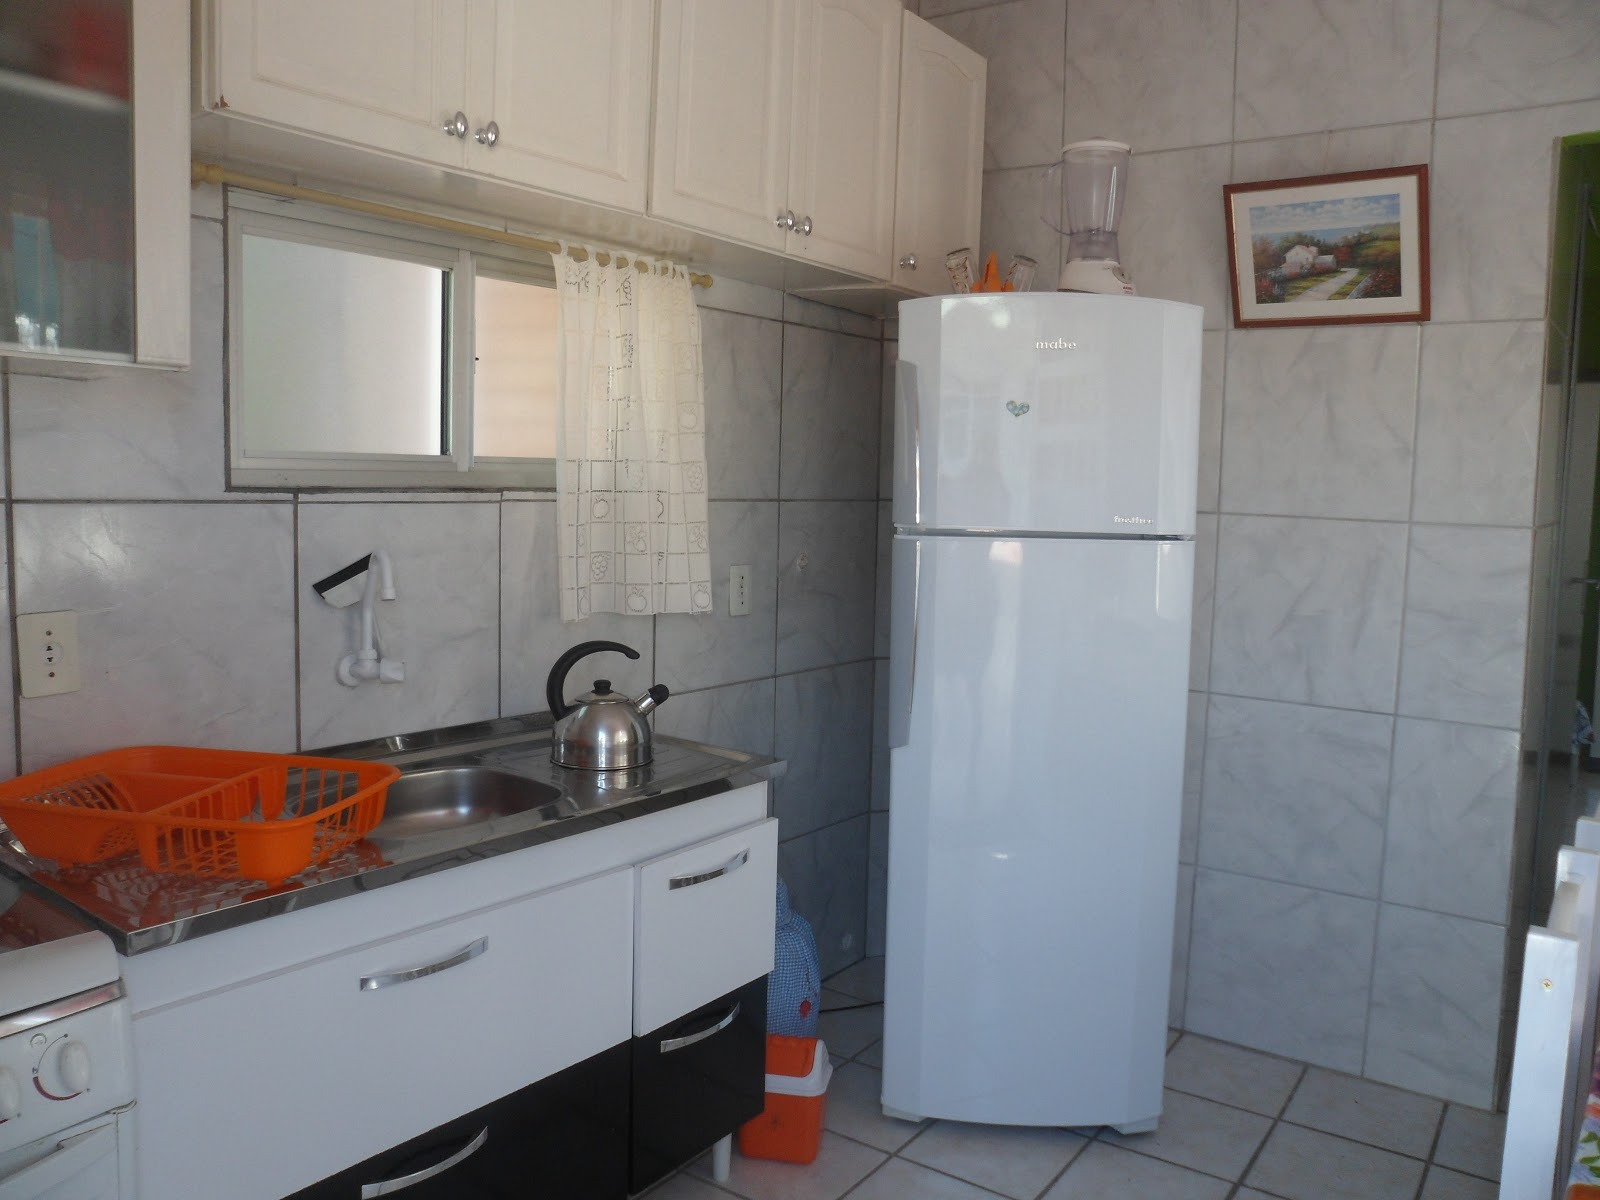 APTO PARA casal 30M DA PRAIA VERAO 2016 #703624 1600x1200 Banheiro Container Florianopolis